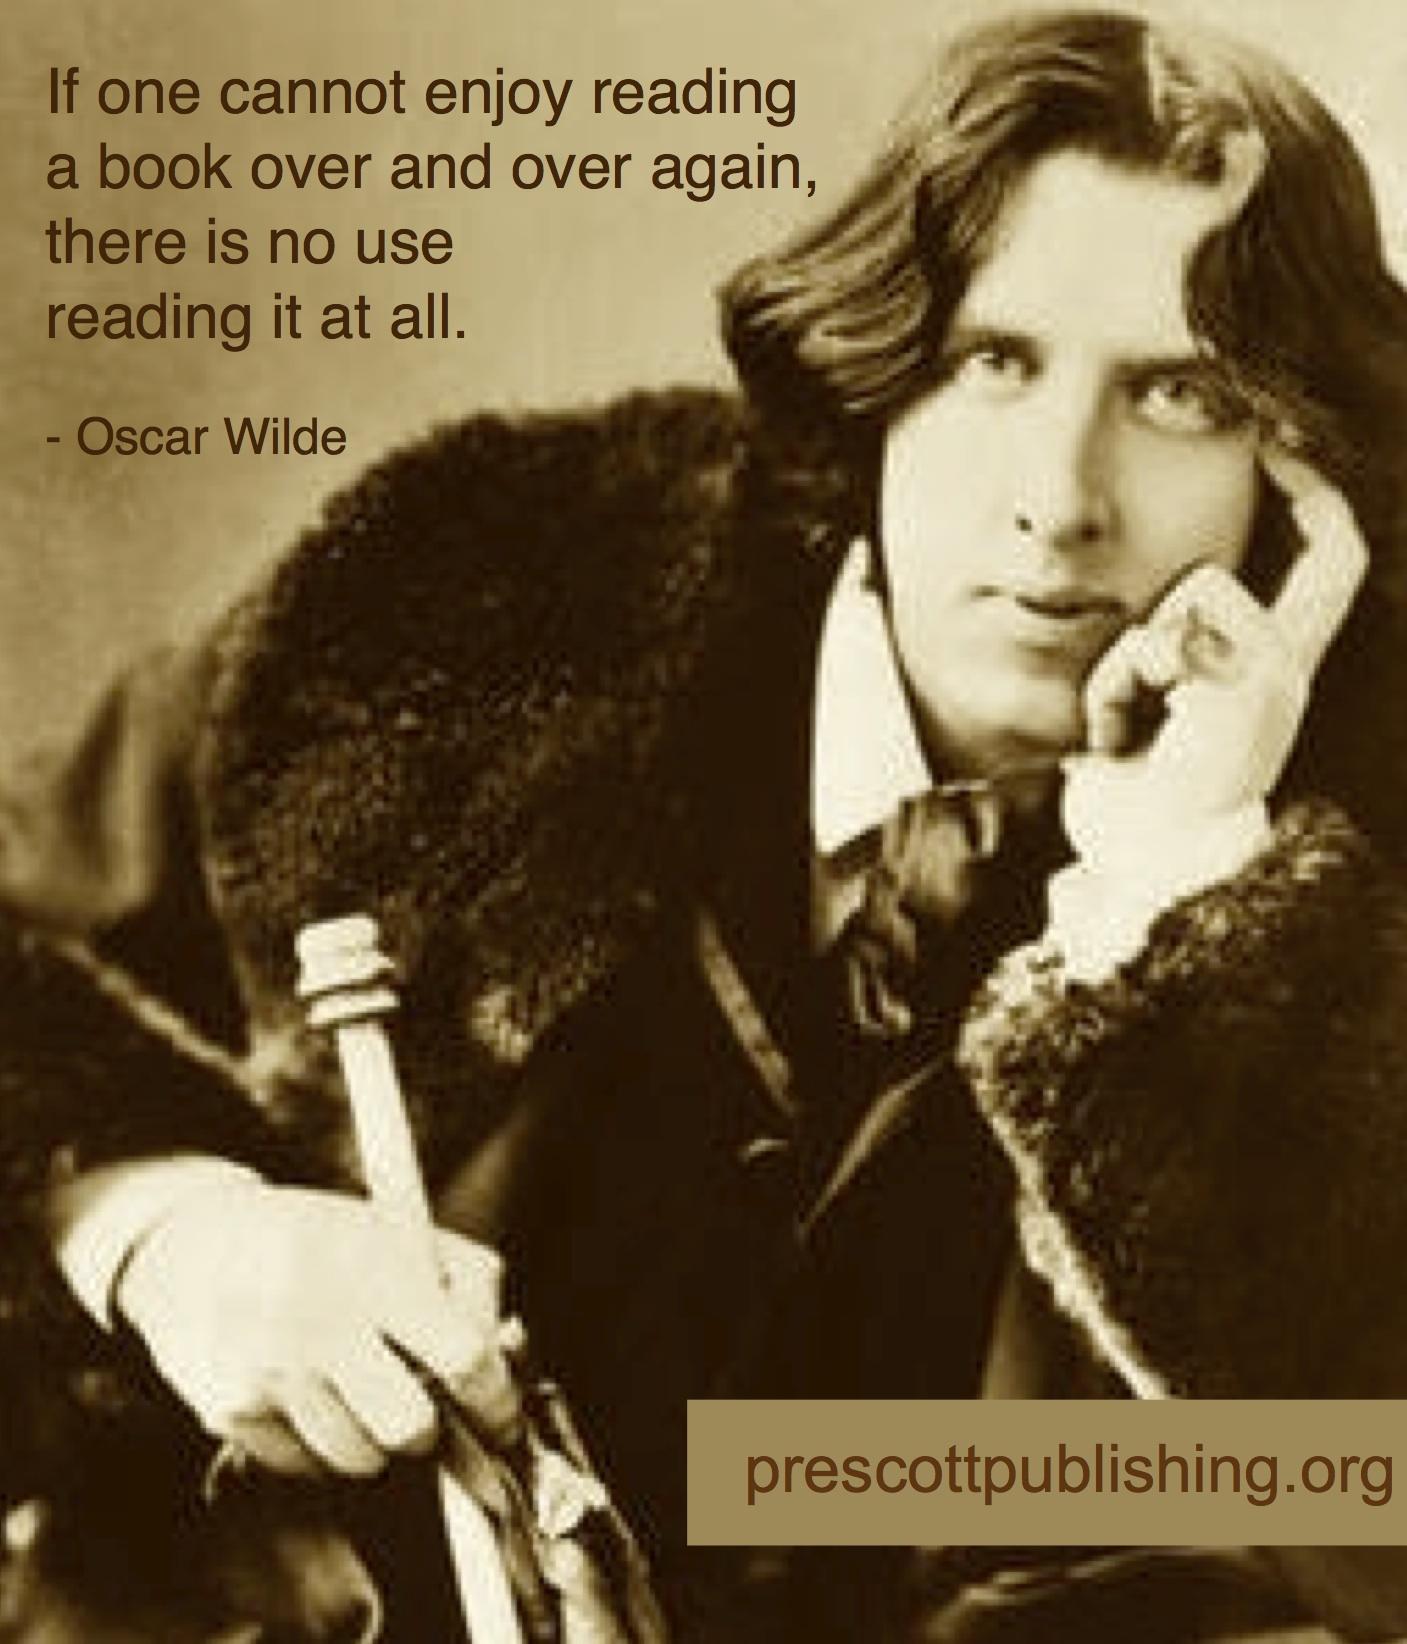 Enjoy Reading Again and Again